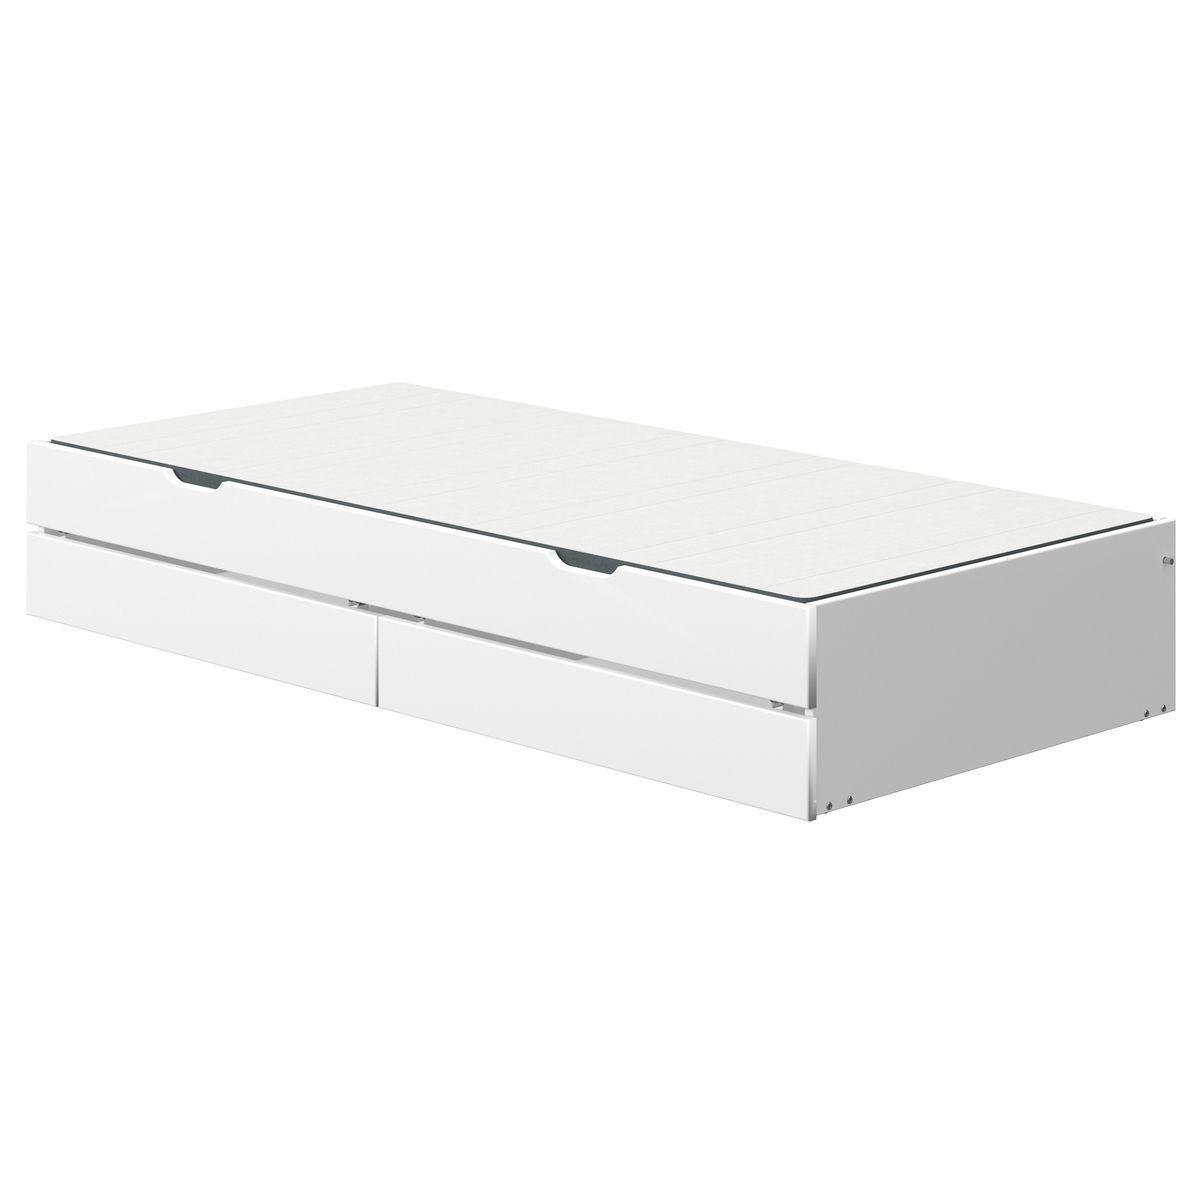 Gästebett-2 Schubladen 200cm NOR Flexa weiß